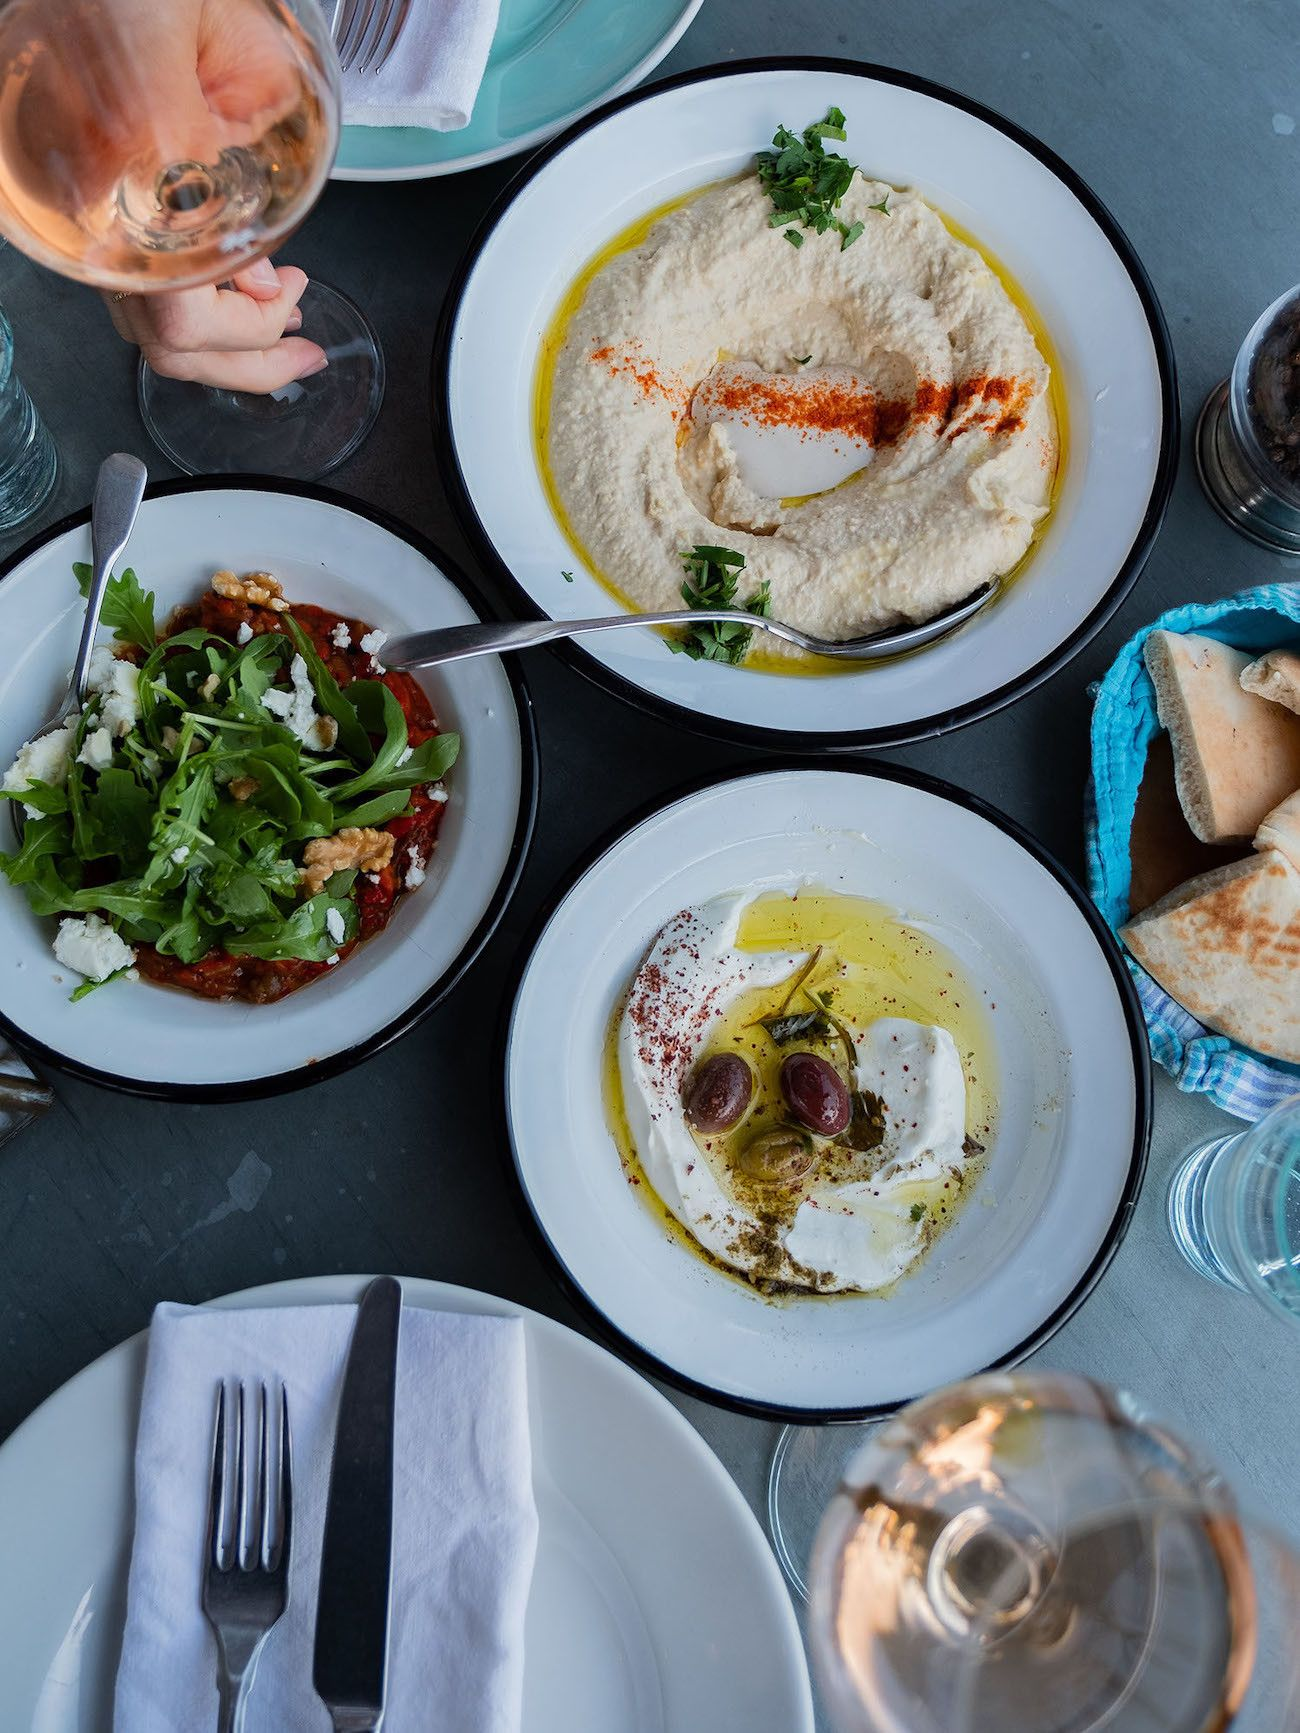 Foodblog About Fuel, Bikini Island & Mountain Hotels, Vorspeisen, Hummus, Labneh, Sakuska, Wein